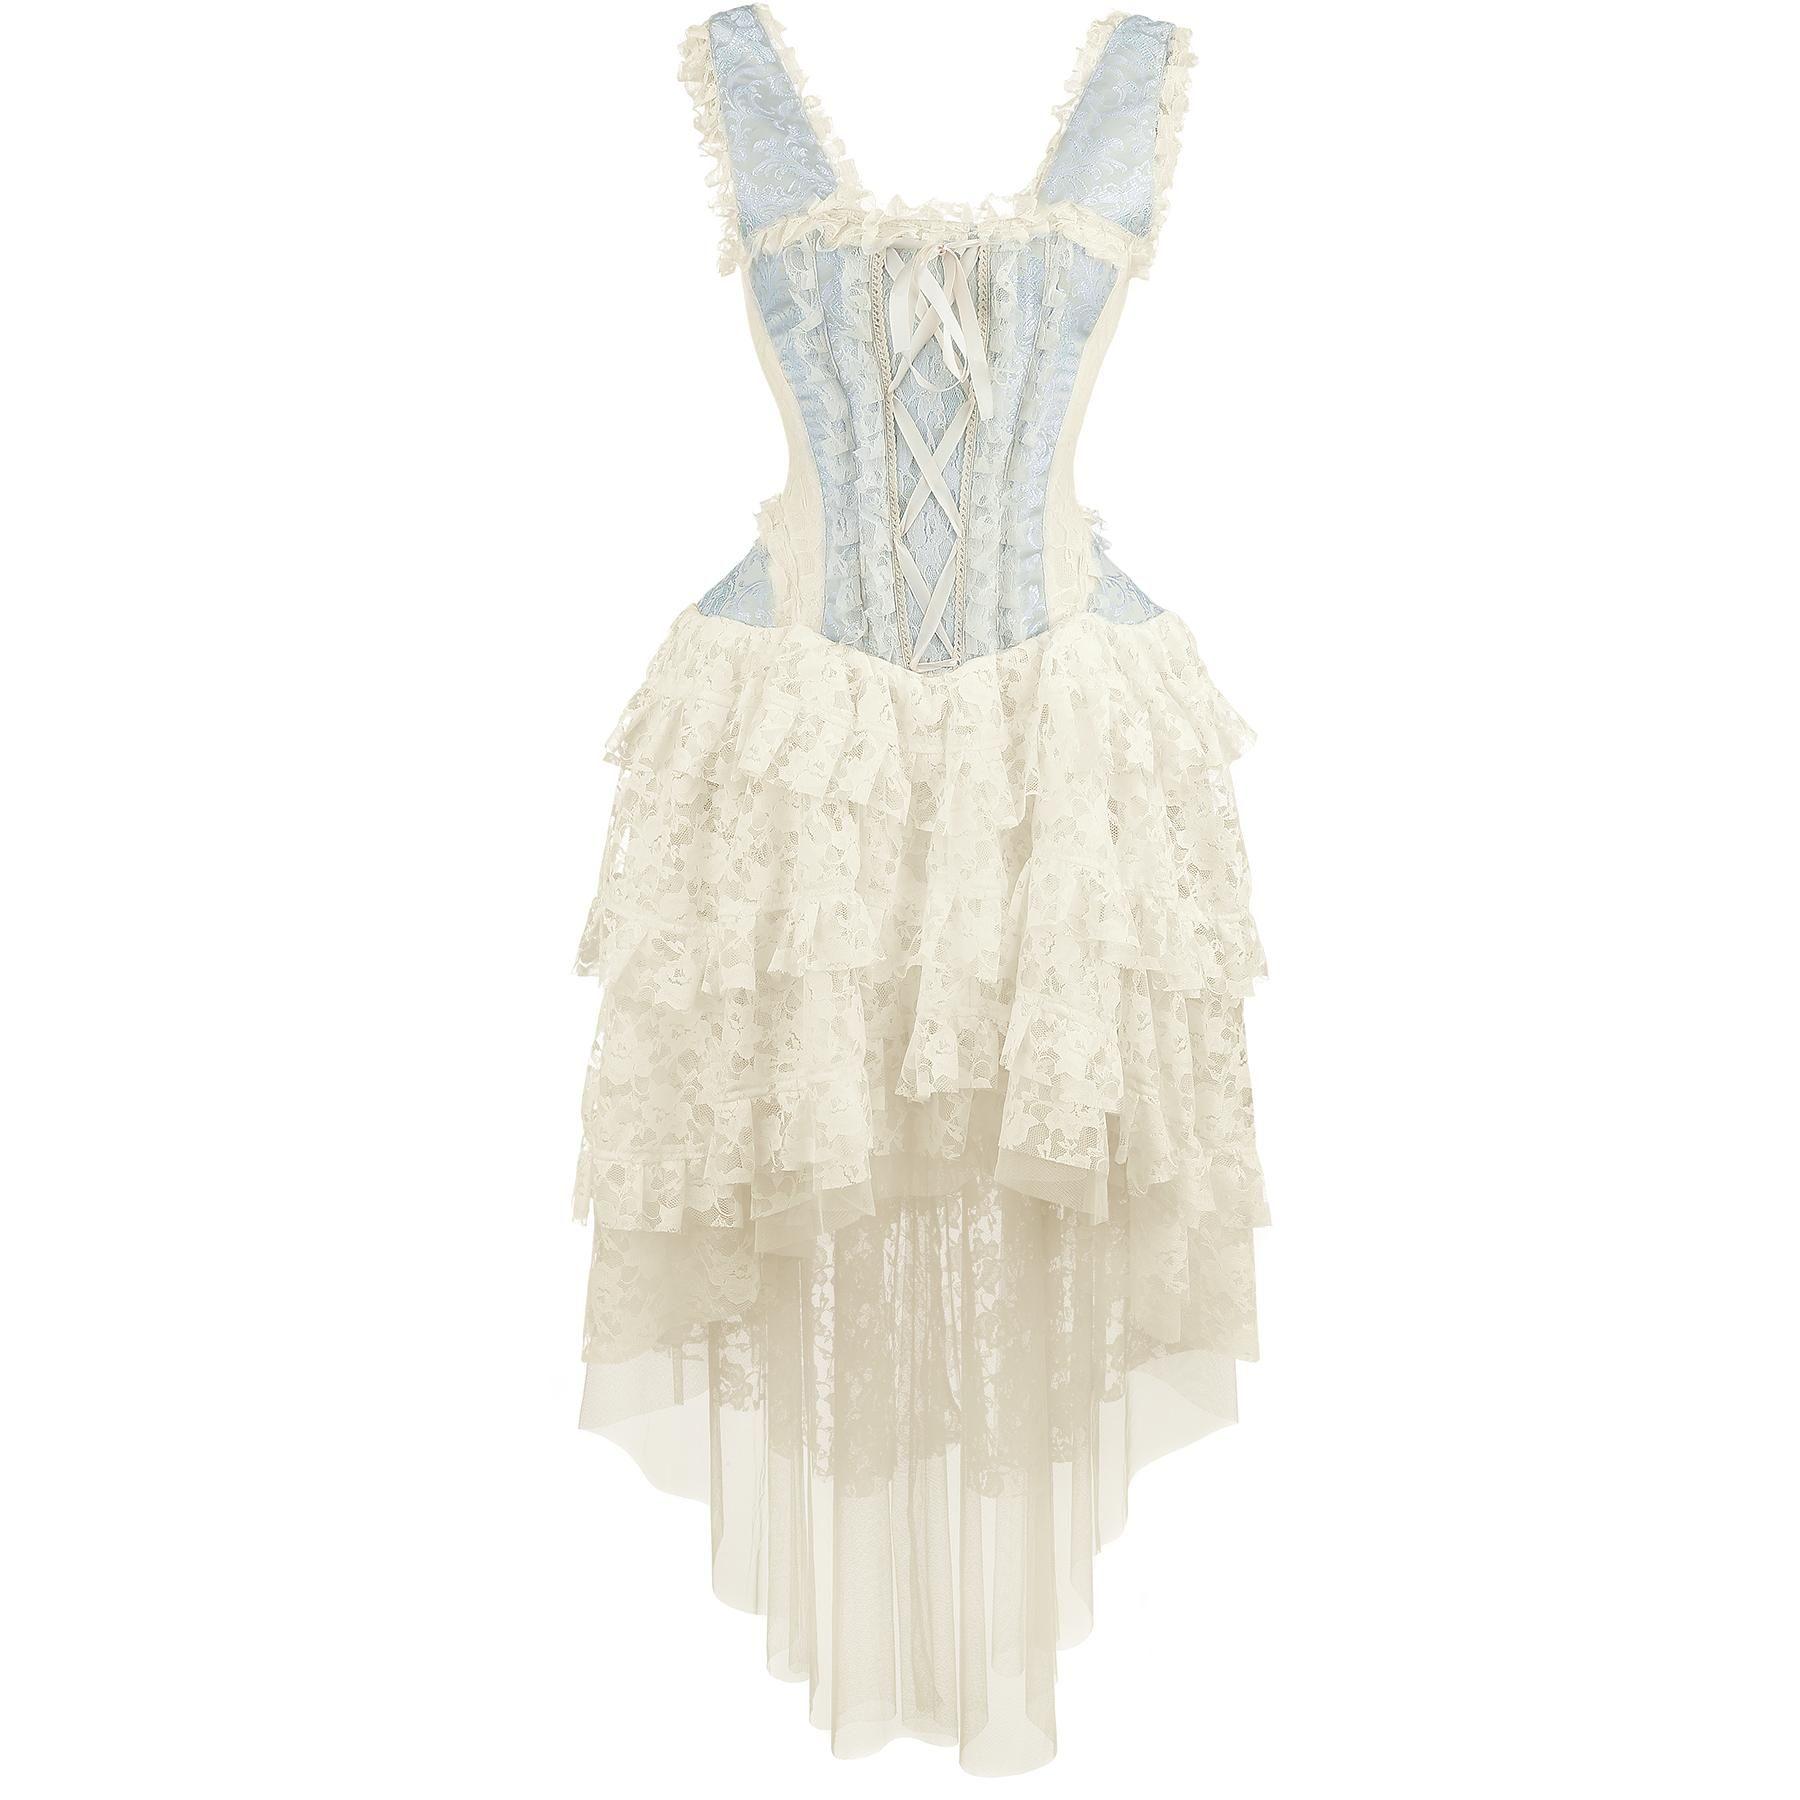 Ophelie Dress - Langes Kleid von Burleska | CLOTHING | Pinterest ...